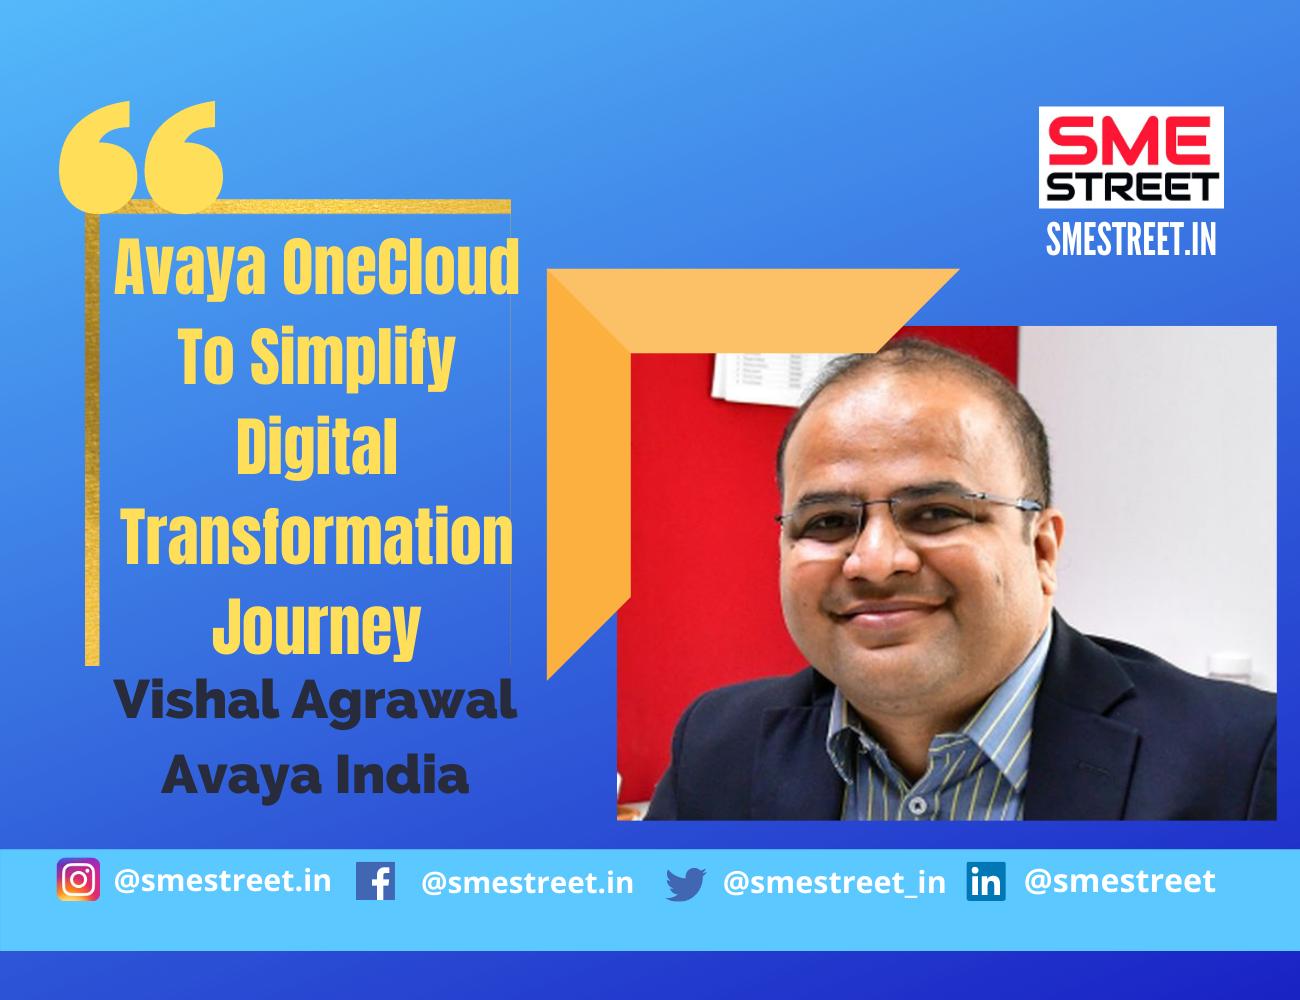 Vishal Agrawal, Avaya India, Avaya OneCloud